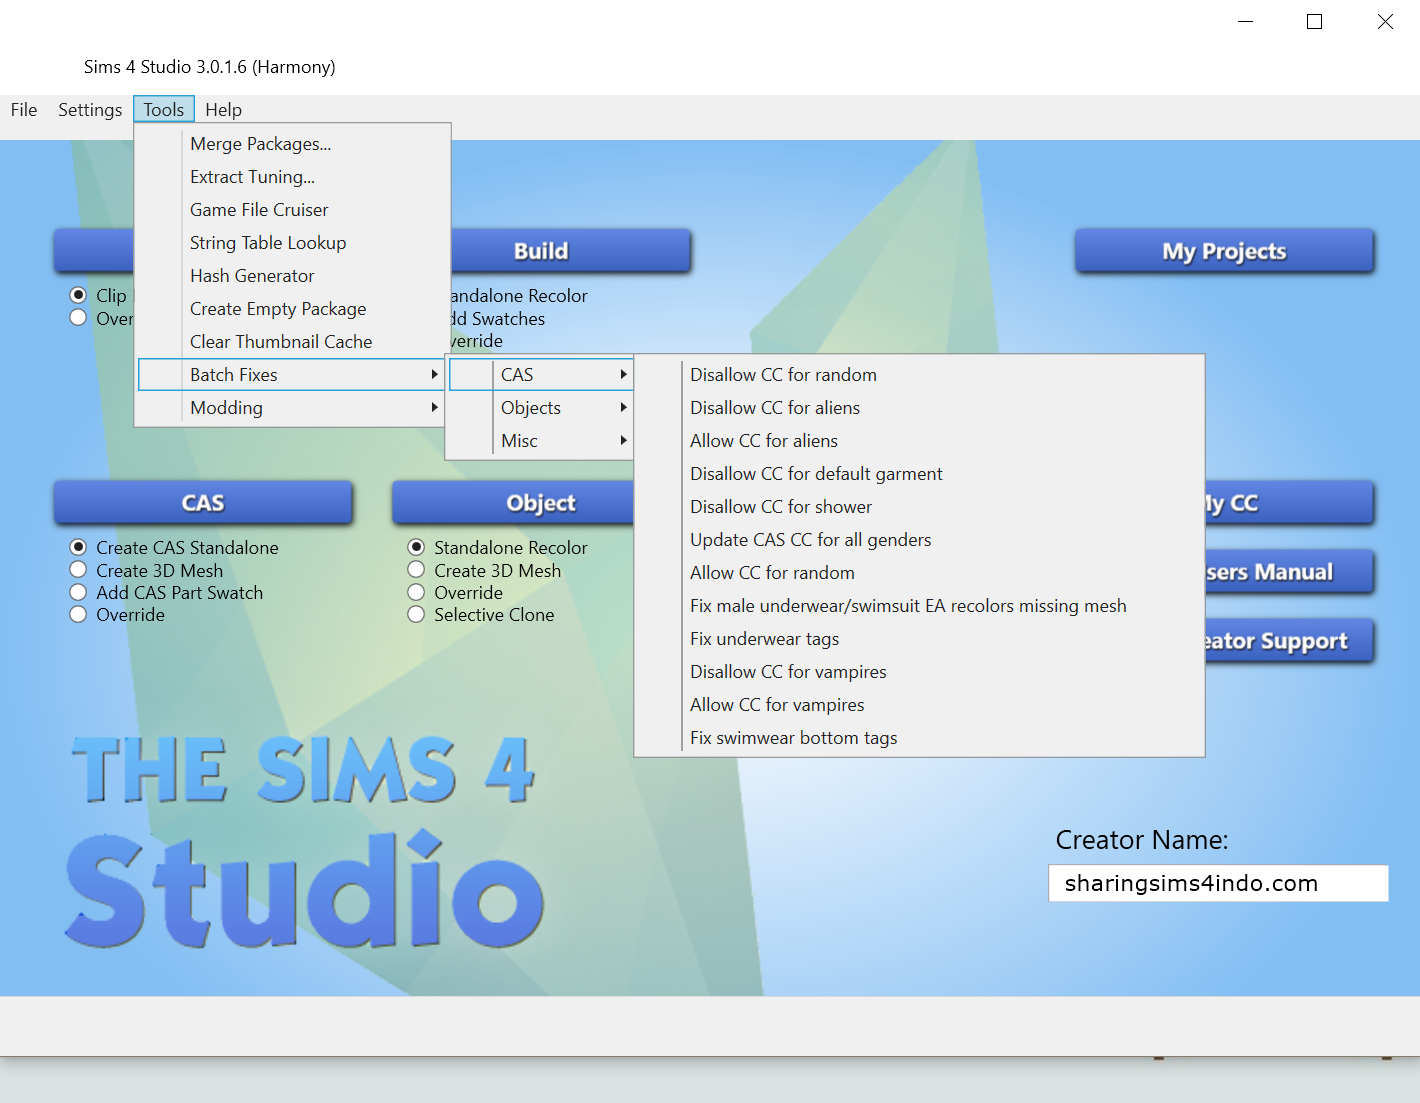 the sims 4 studio download windows